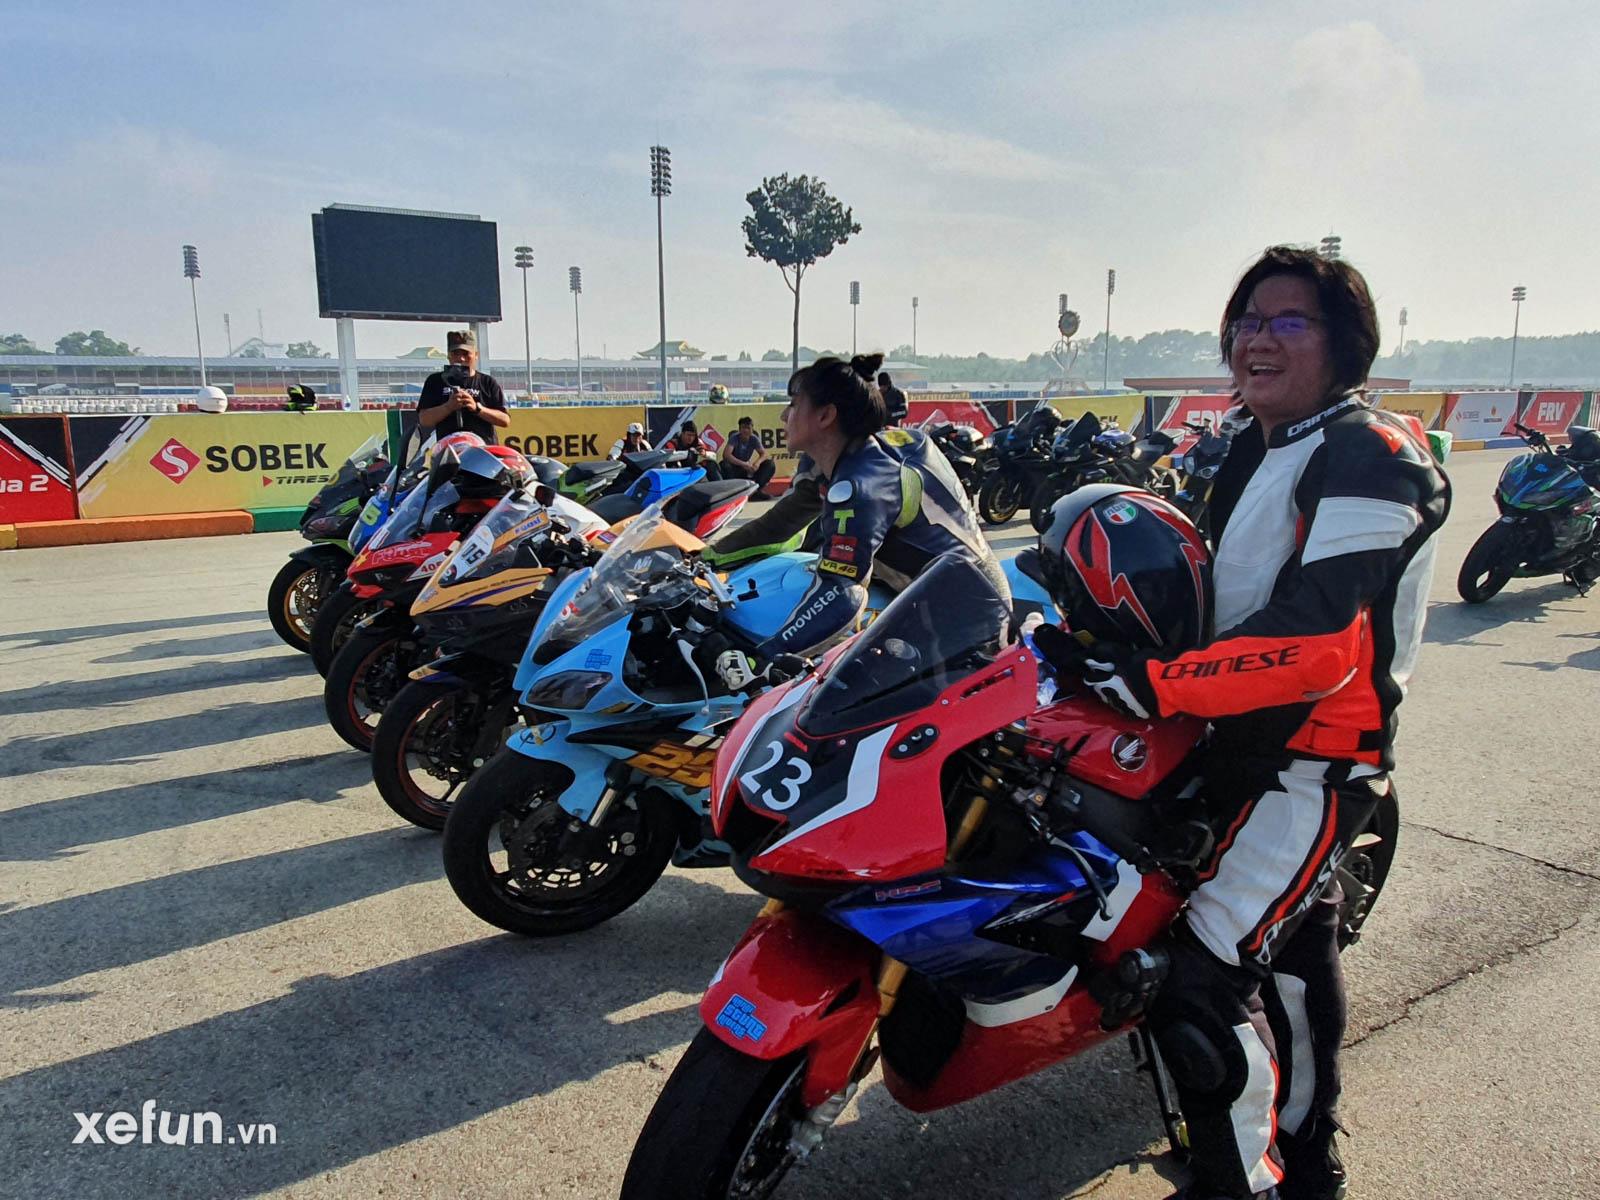 Tin mới nhất Giải đua xe Môtô Awakening Road 2021 Xefun - 2 (26)5465